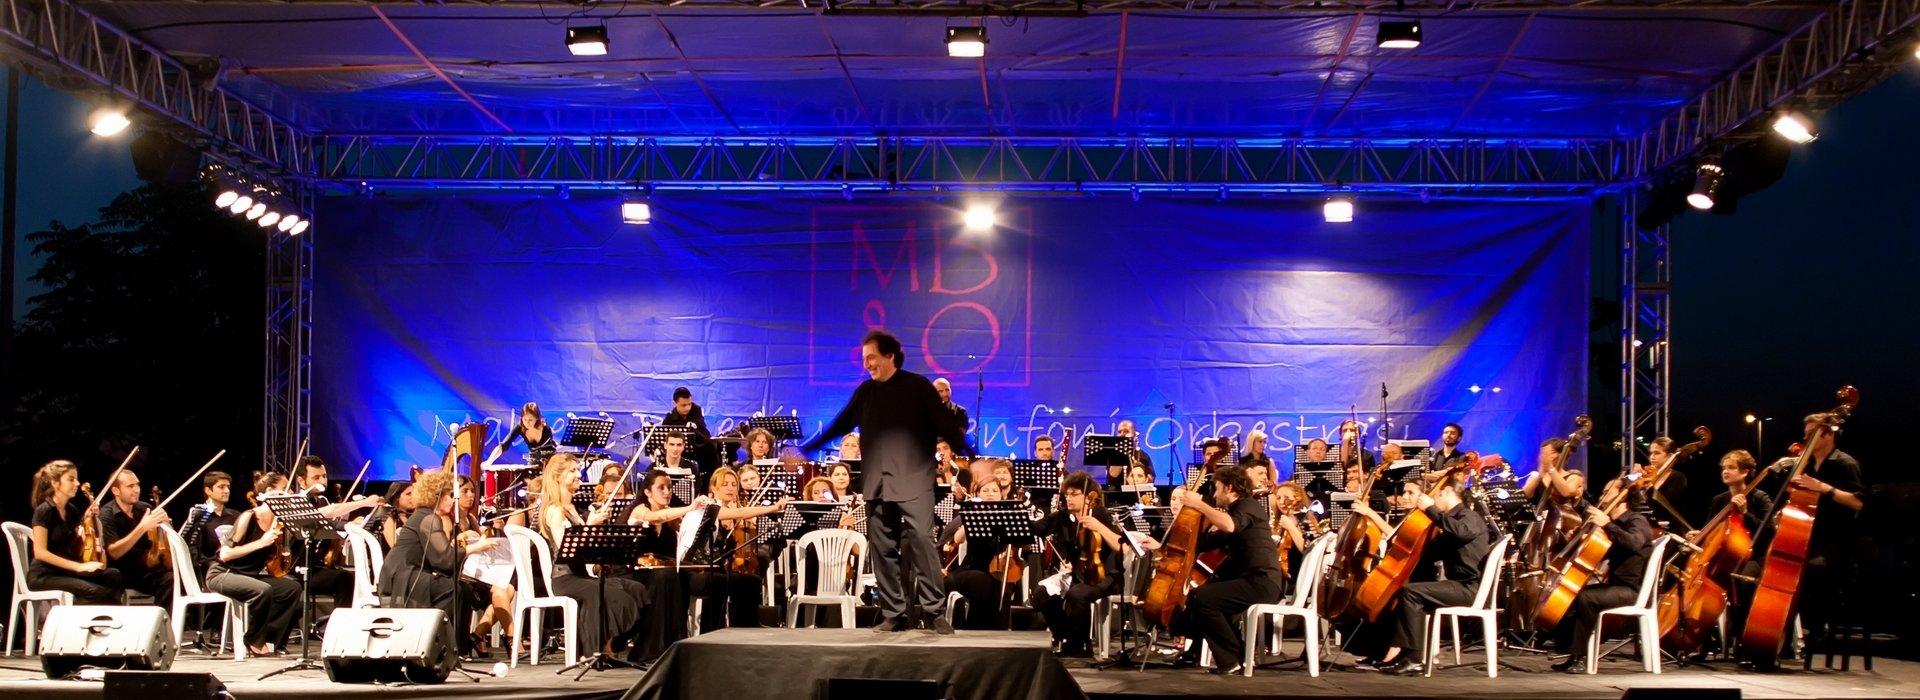 Budapest Klassische Musik Konzerte - Klassische Musik Konzert in Budapest